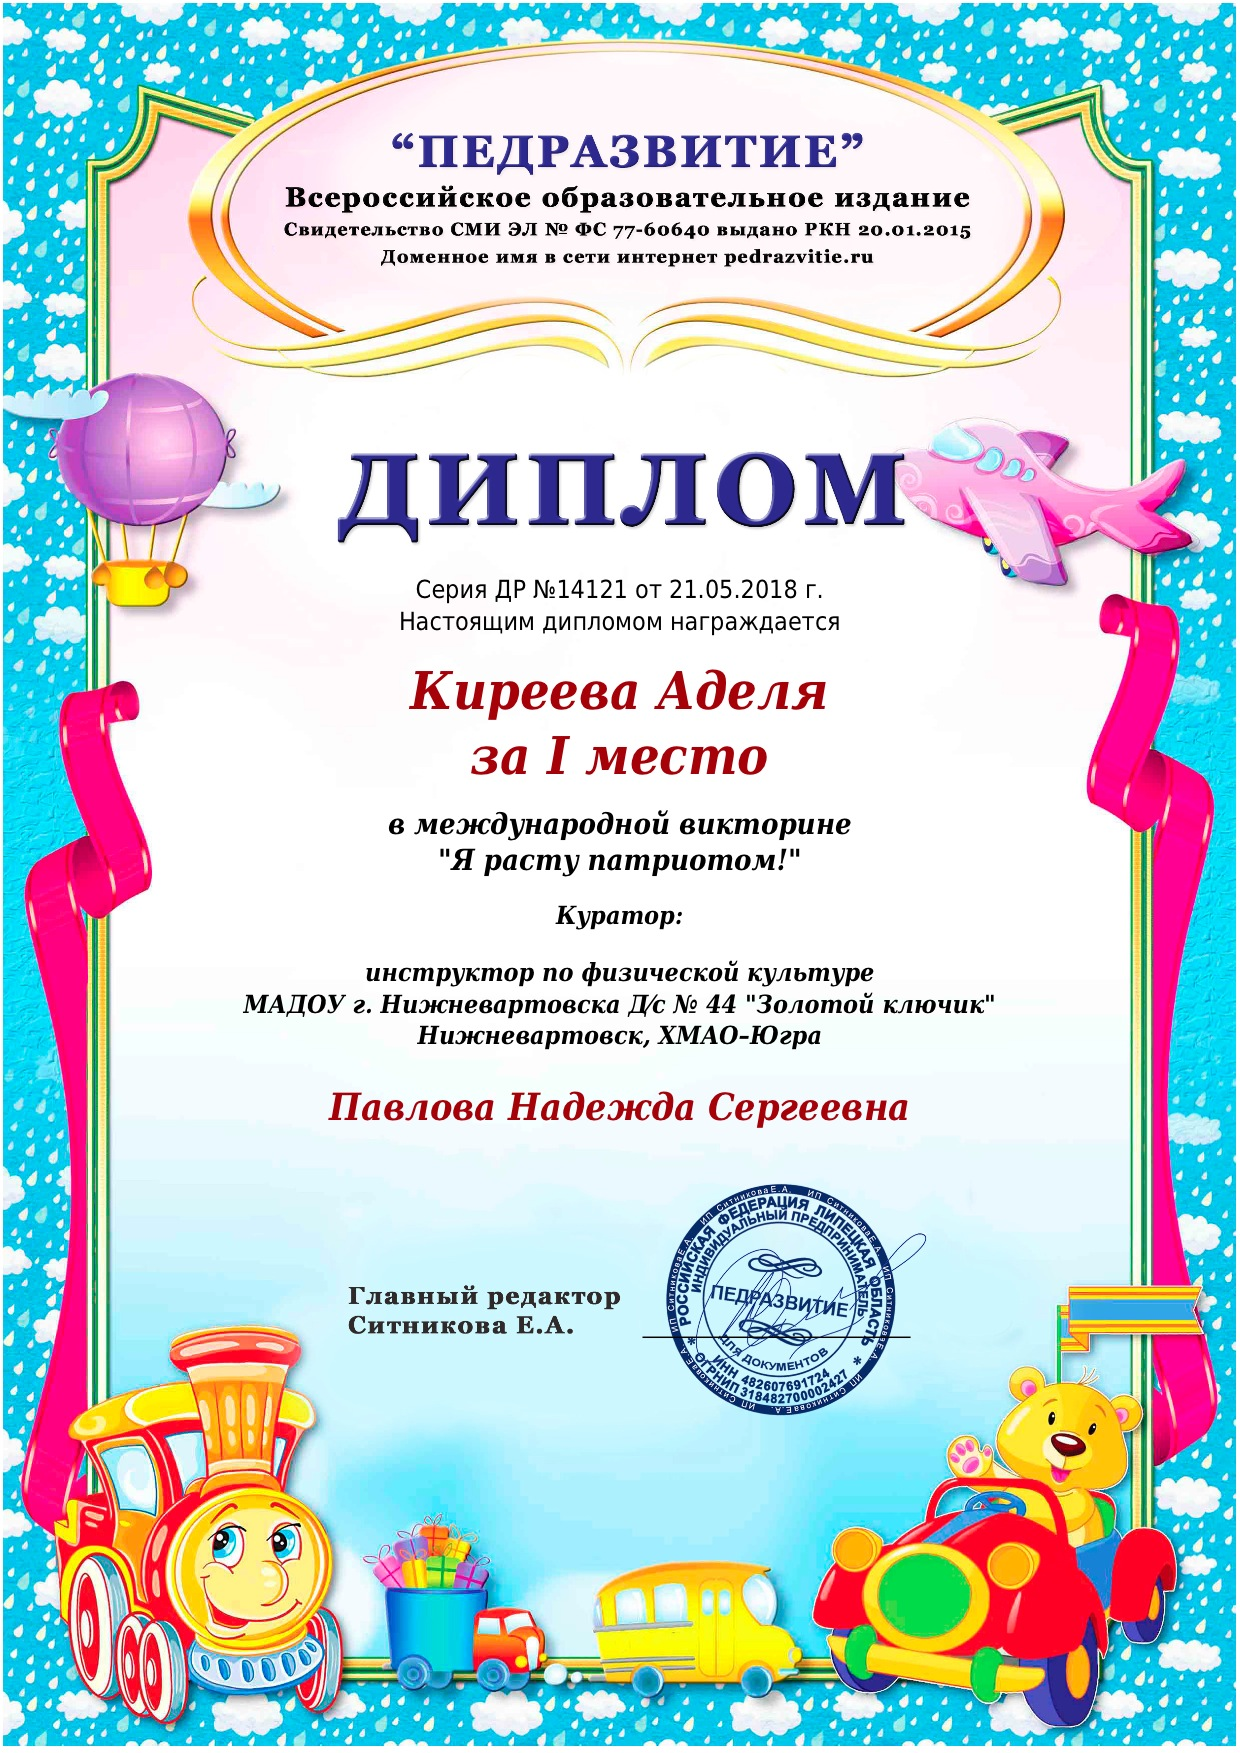 Киреева Аделя